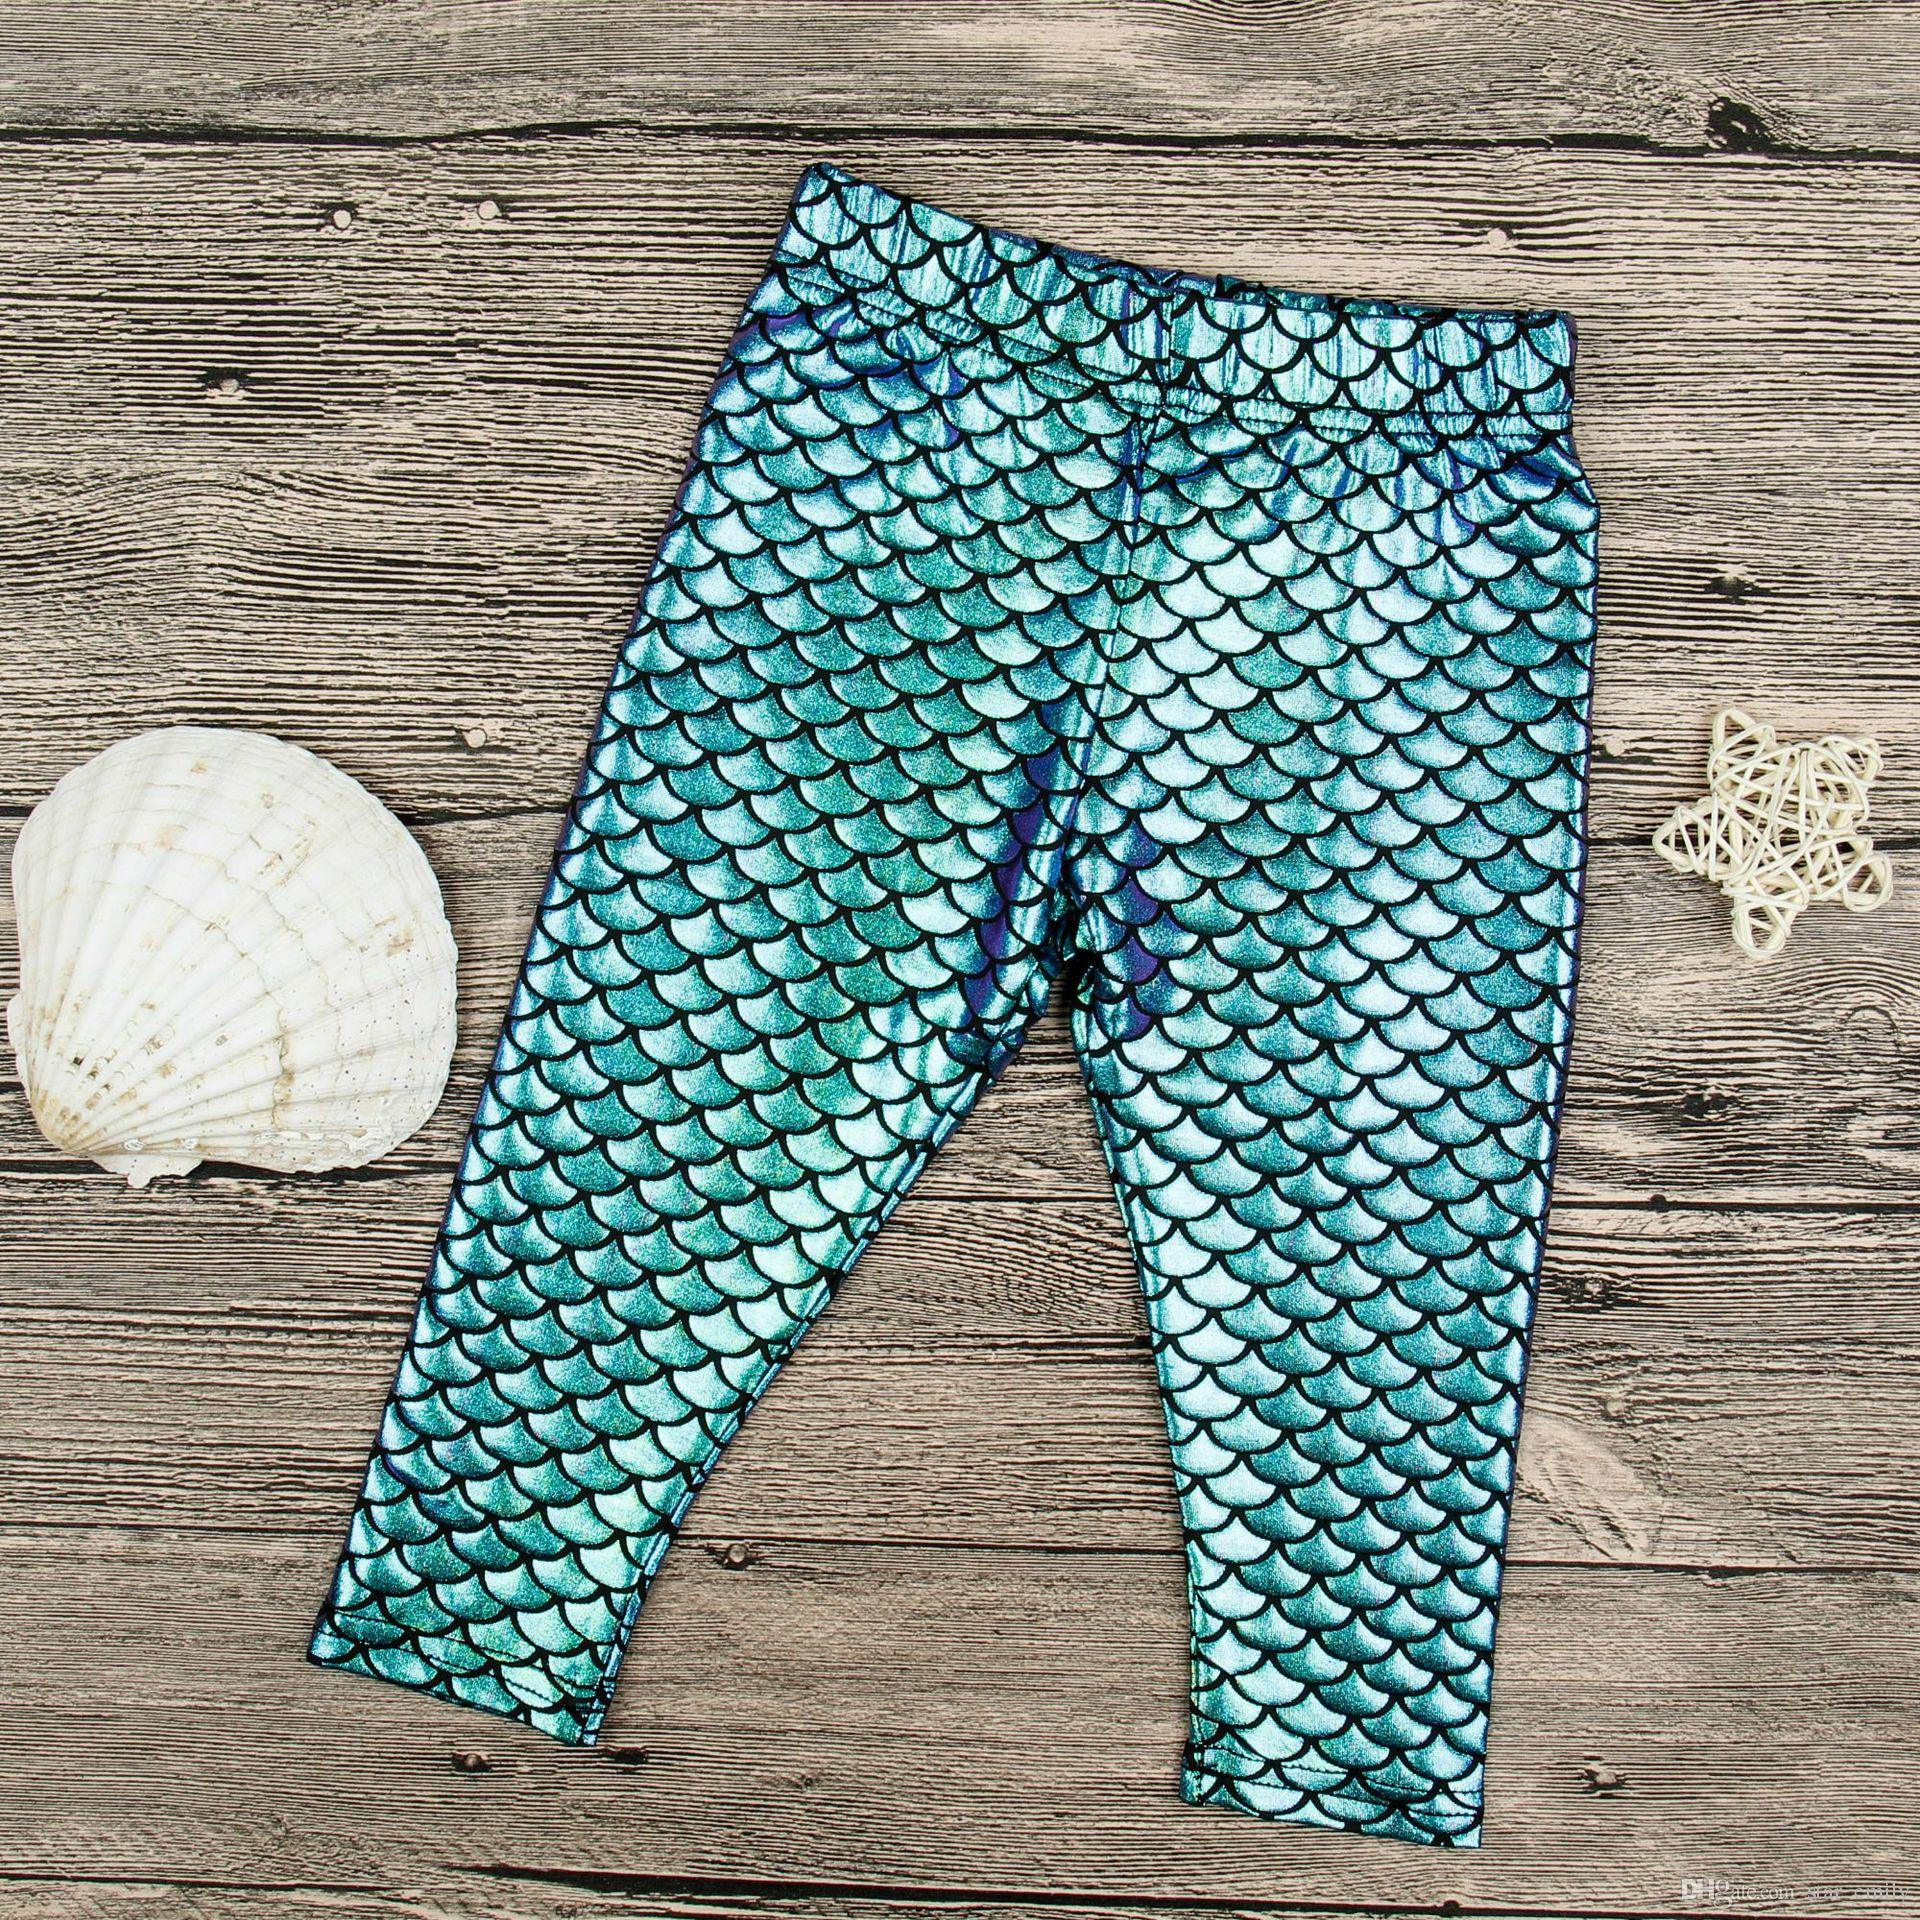 New Girls Kids Mermaid unicorn Cute Pants baby Colorful Digital Printing Child Leggings Pants mermaid fish scale shiny pants for girl 360